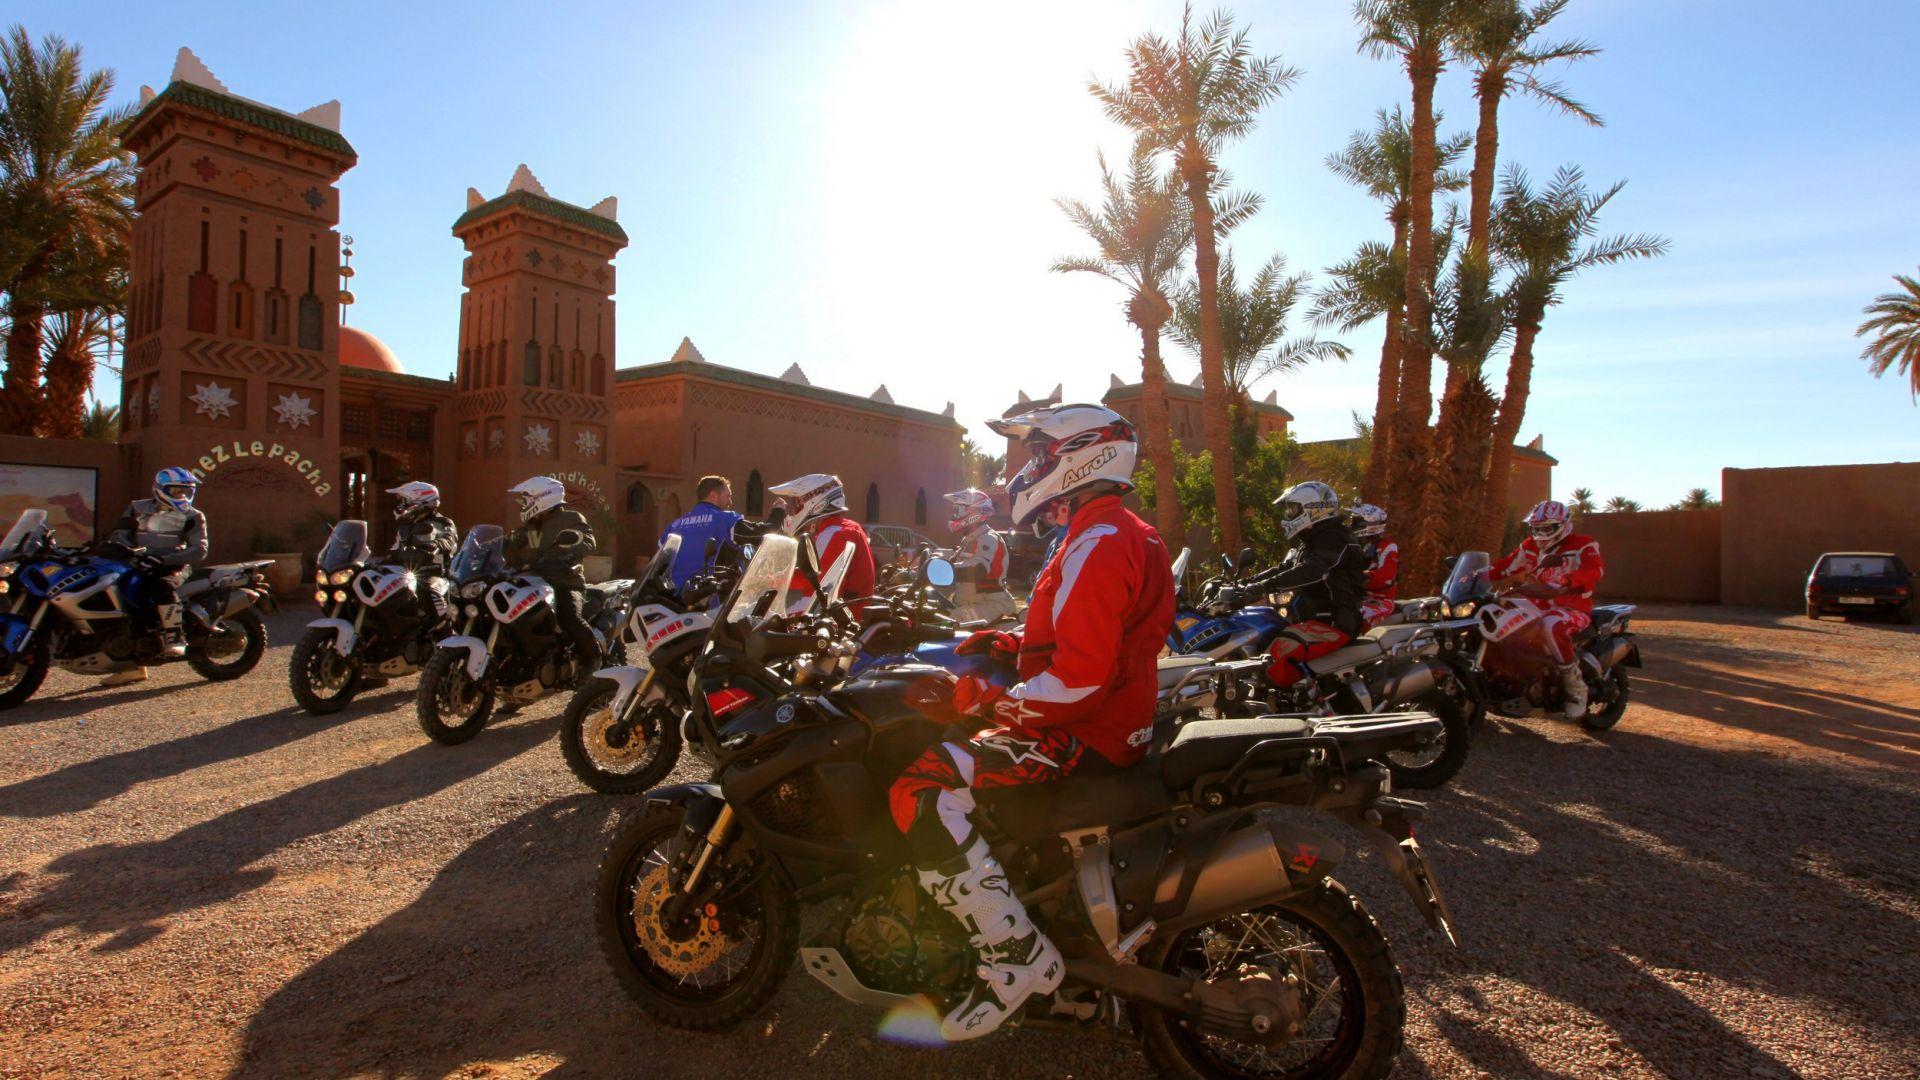 Immagine 85: In Marocco con la Yamaha Super Ténéré